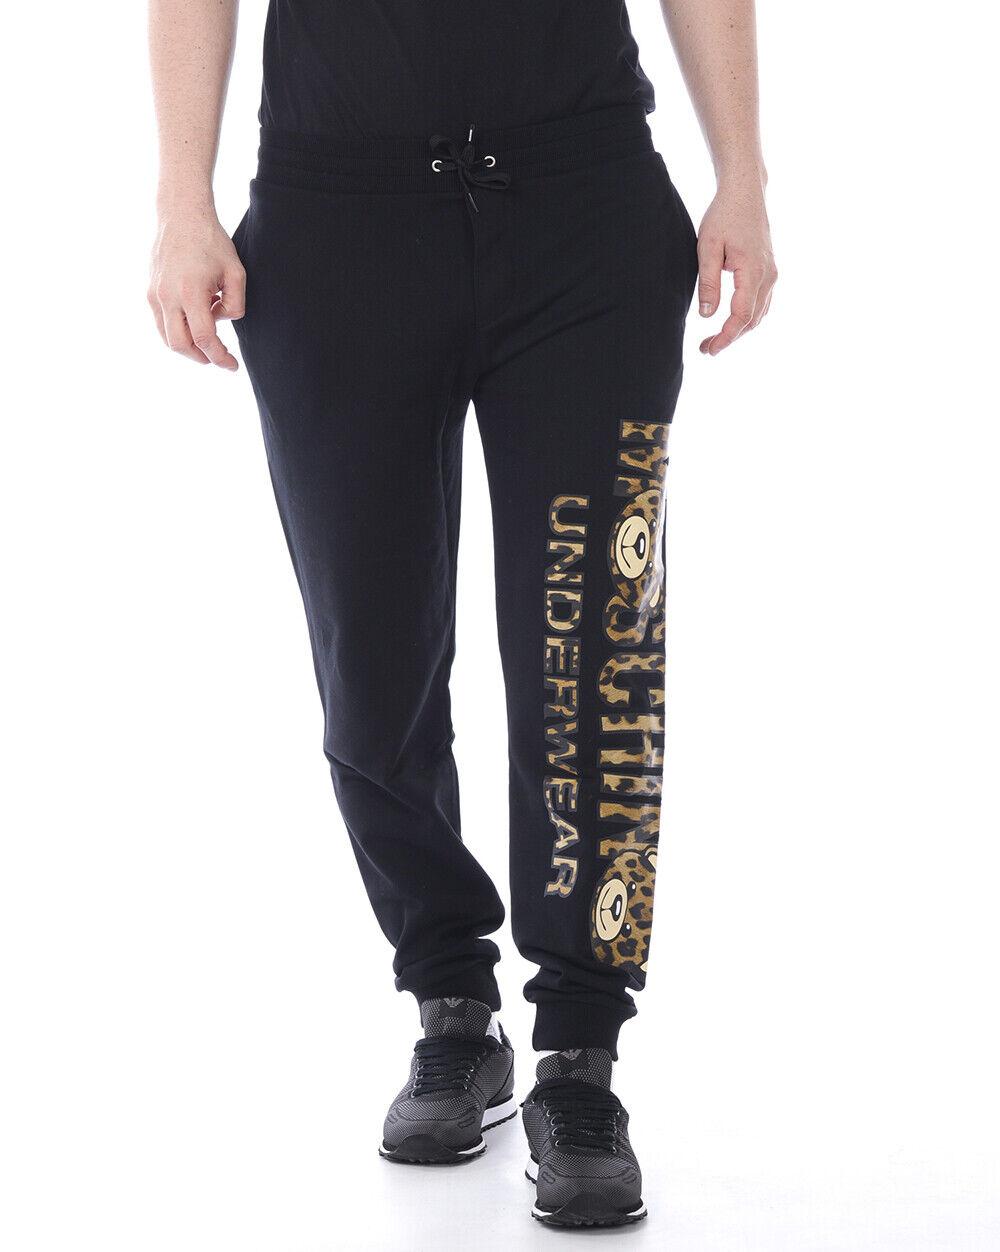 Moschino Underwear Tracksuit Cotton Man Black A4201 8129 555 Sz. XS PUT OFFER